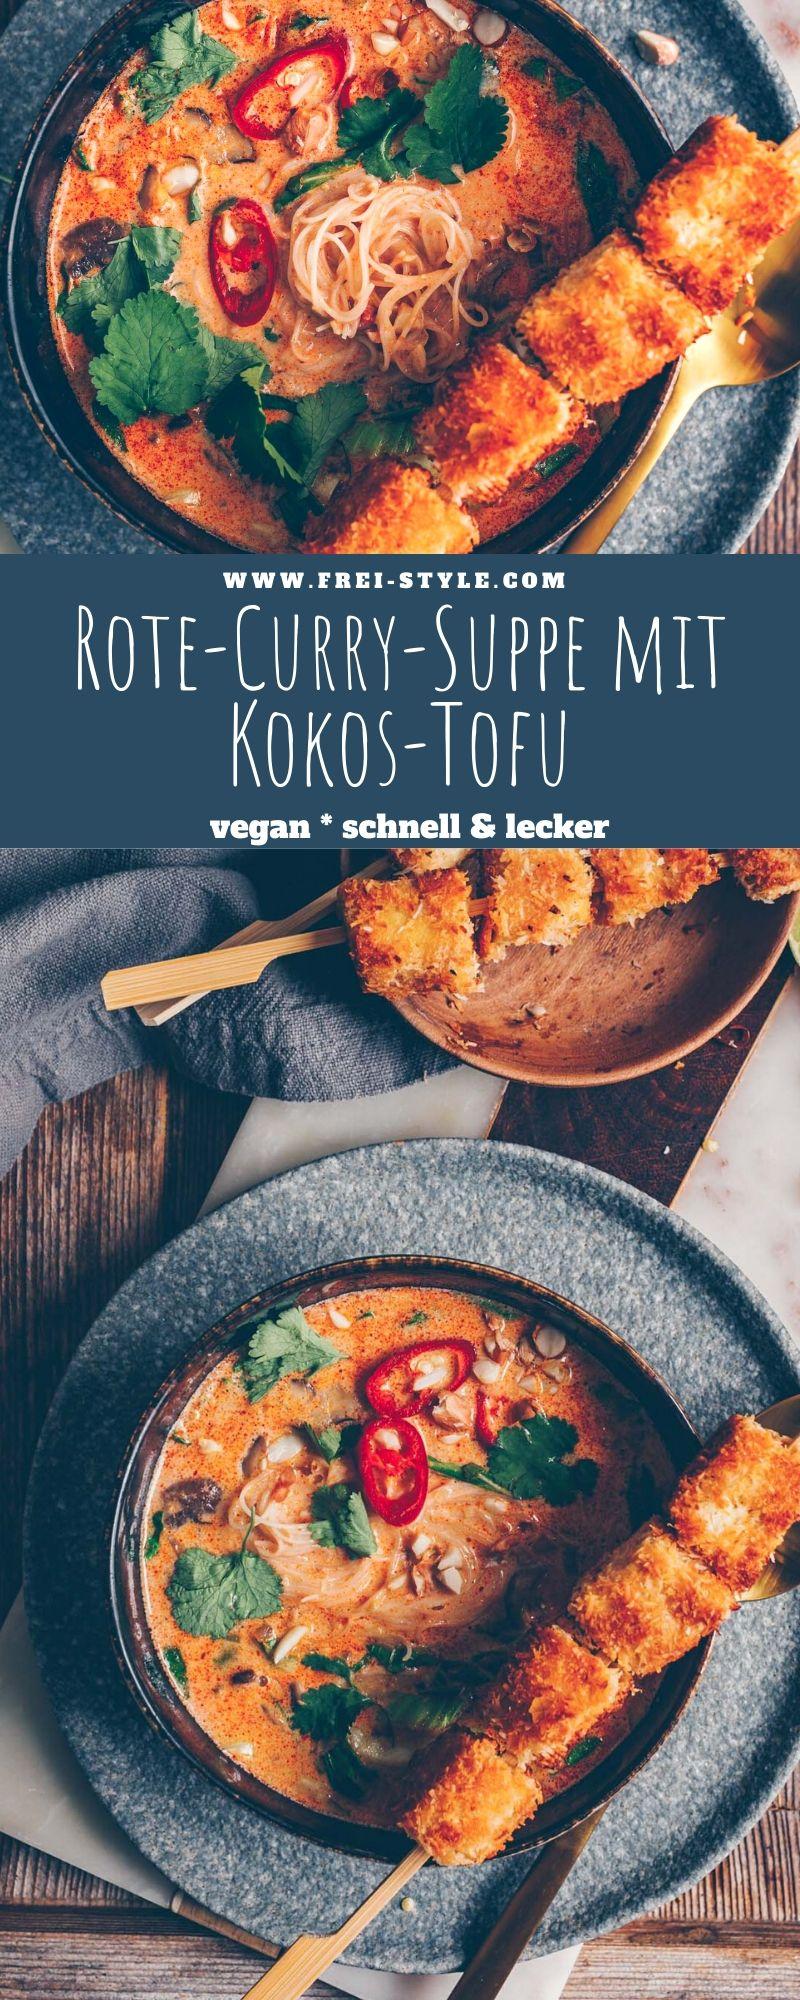 Rote-Curry-Suppe mit Kokos-Tofu